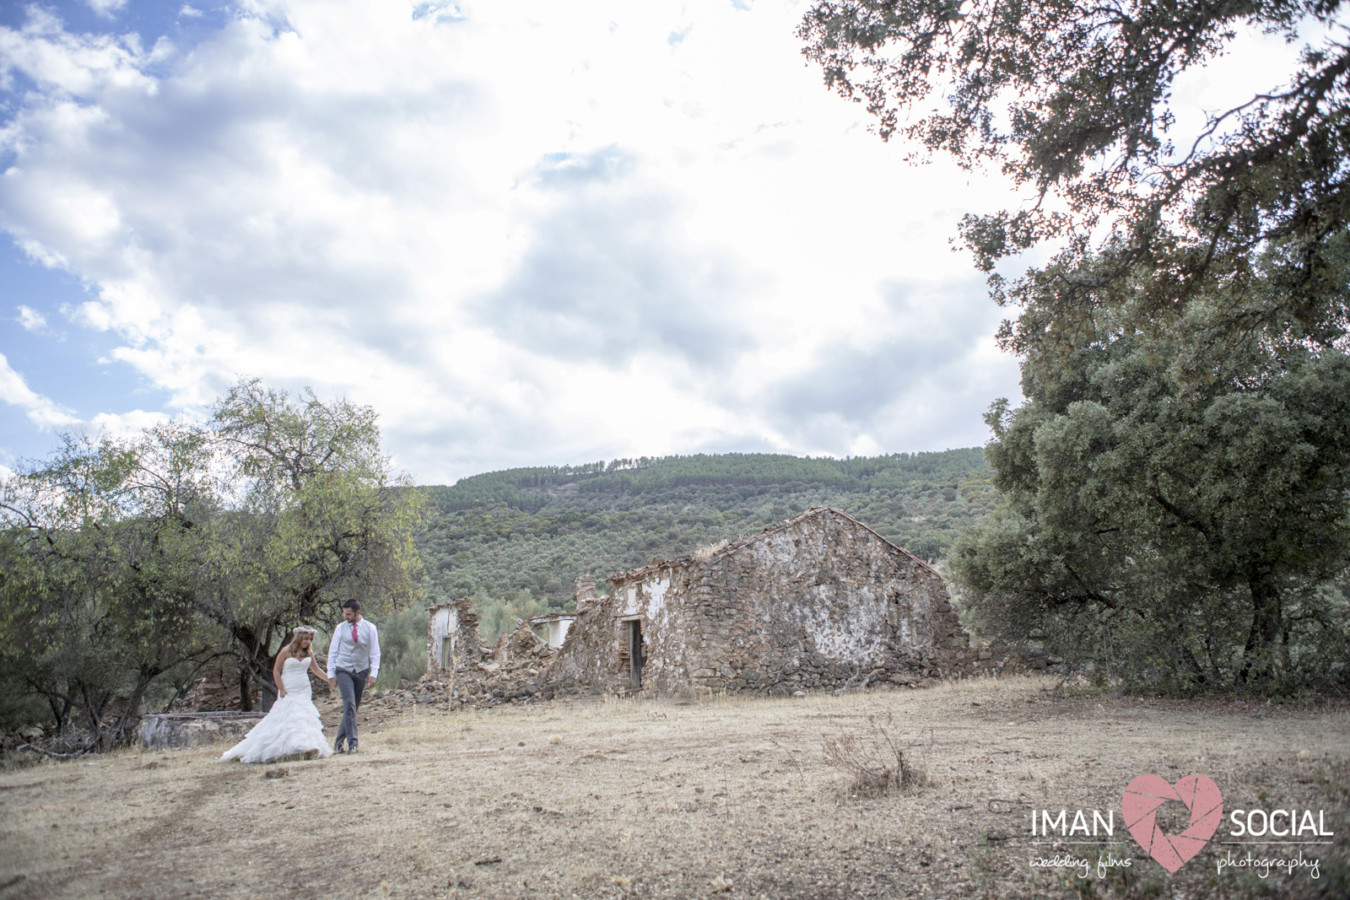 77B0355 Juan Antonio y Mónica - Postboda - video boda cordoba